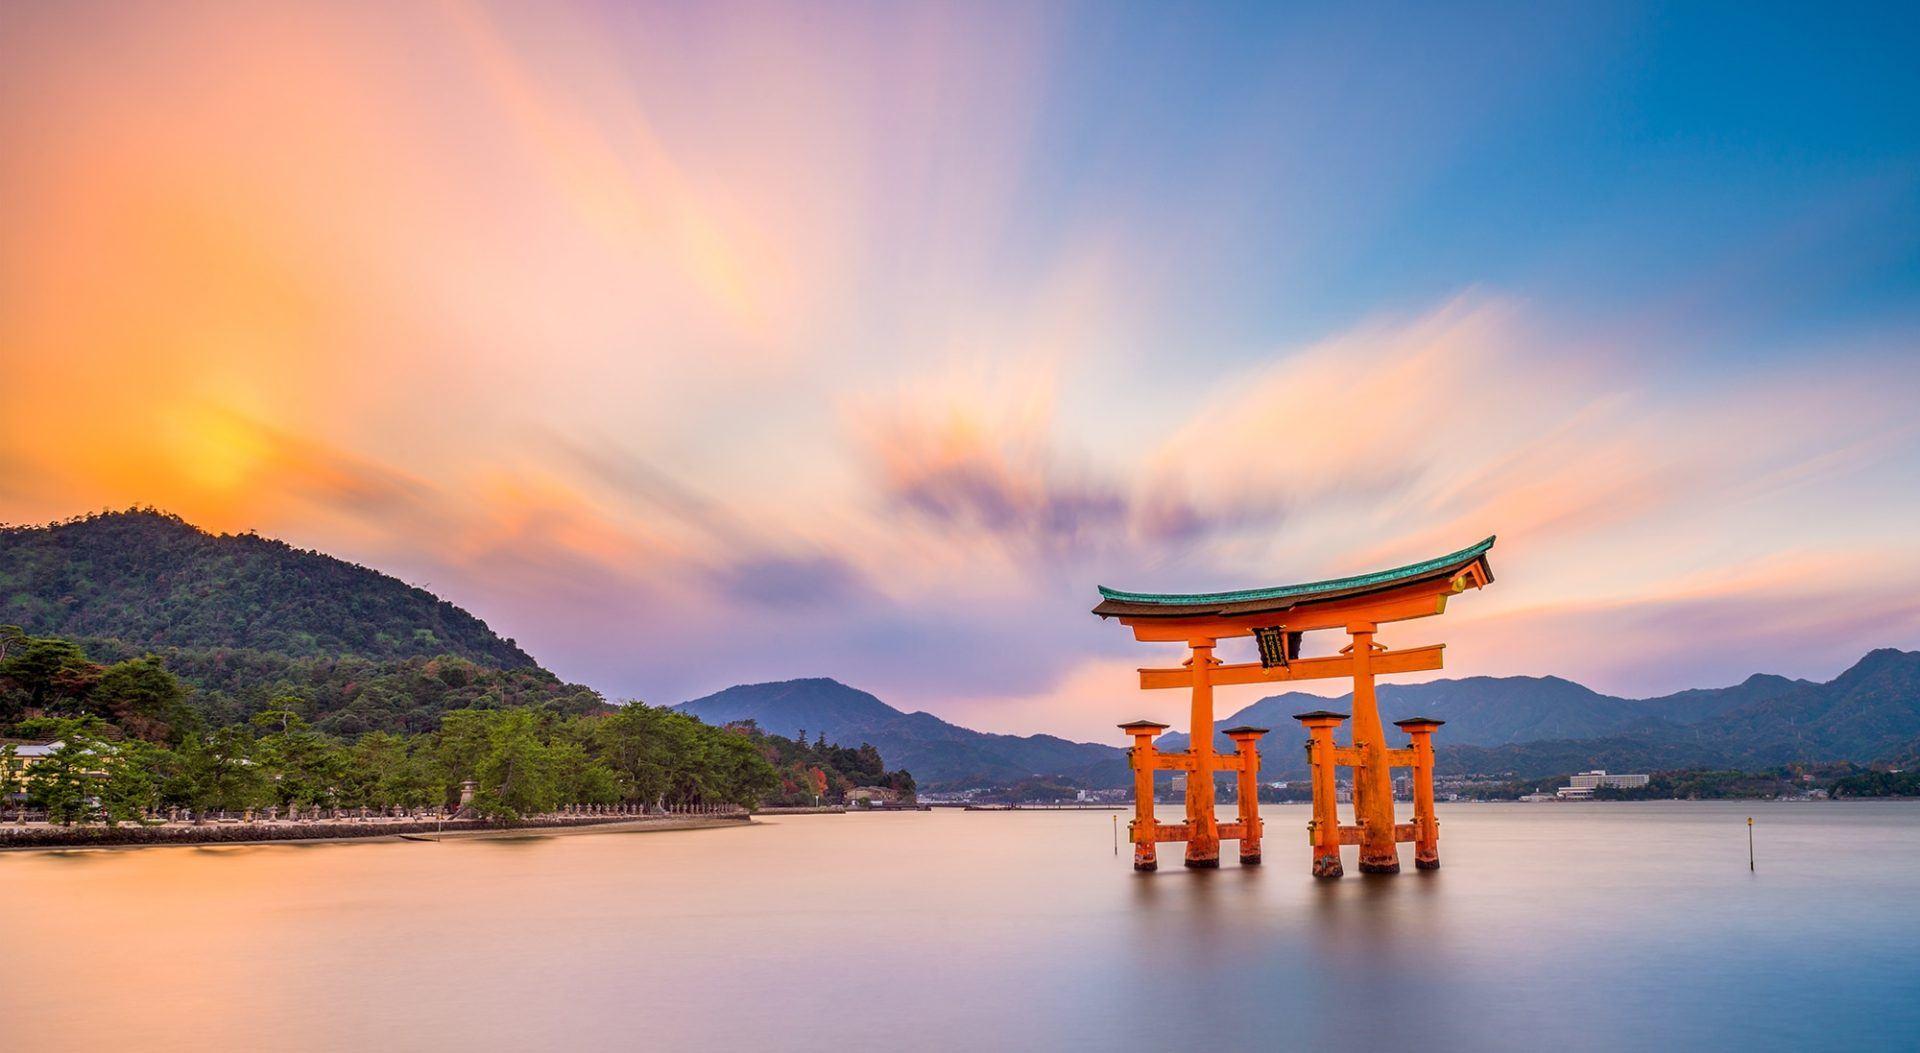 How To Get To Miyajima Island